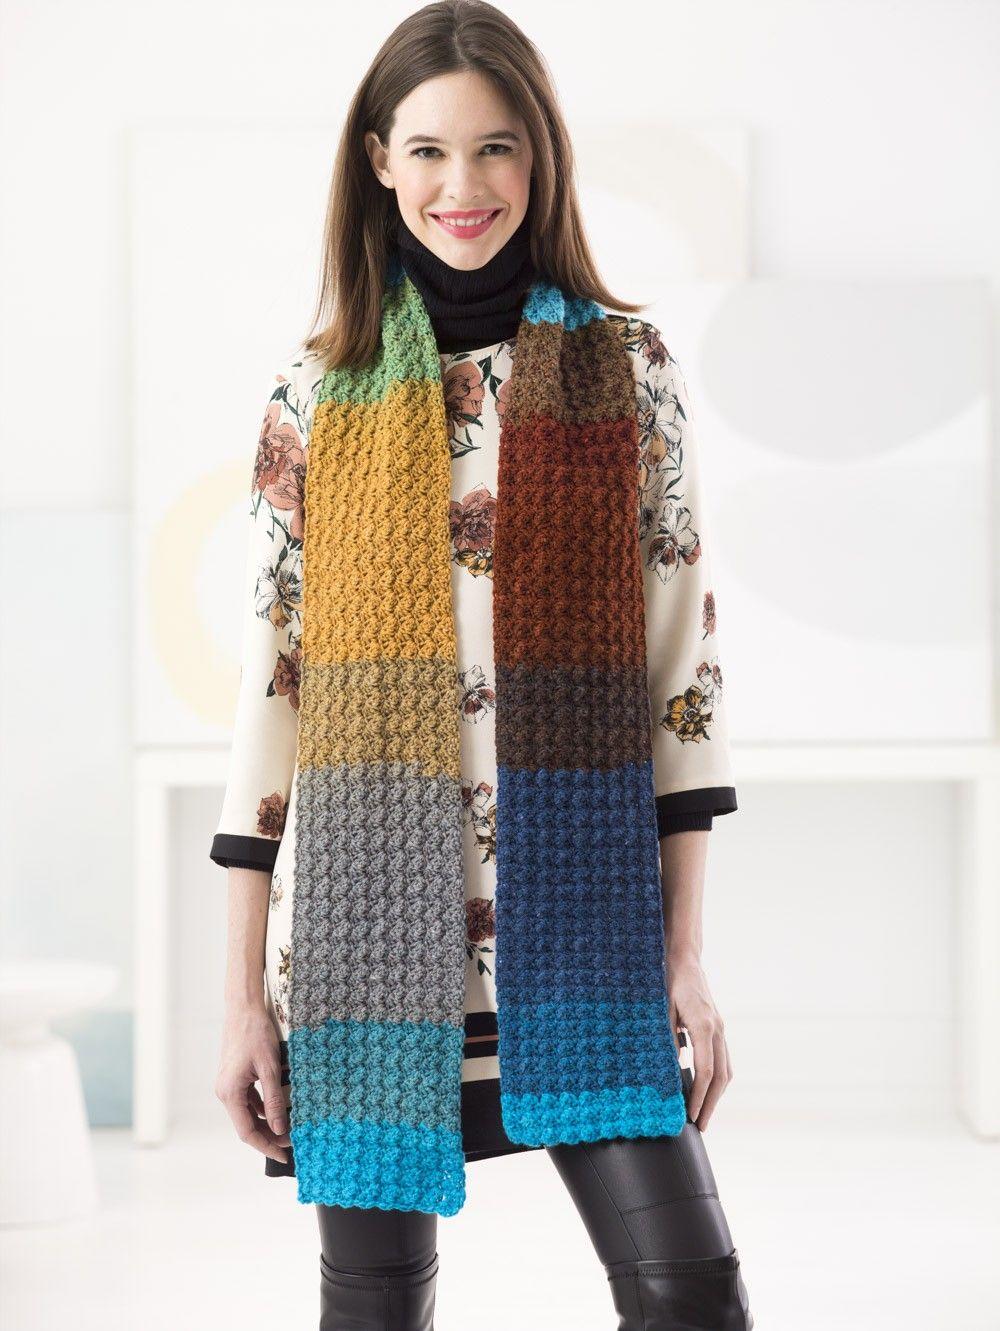 One Ball Scarf (Crochet) *Out of Stock - ETA January 2018 | Crochet ...